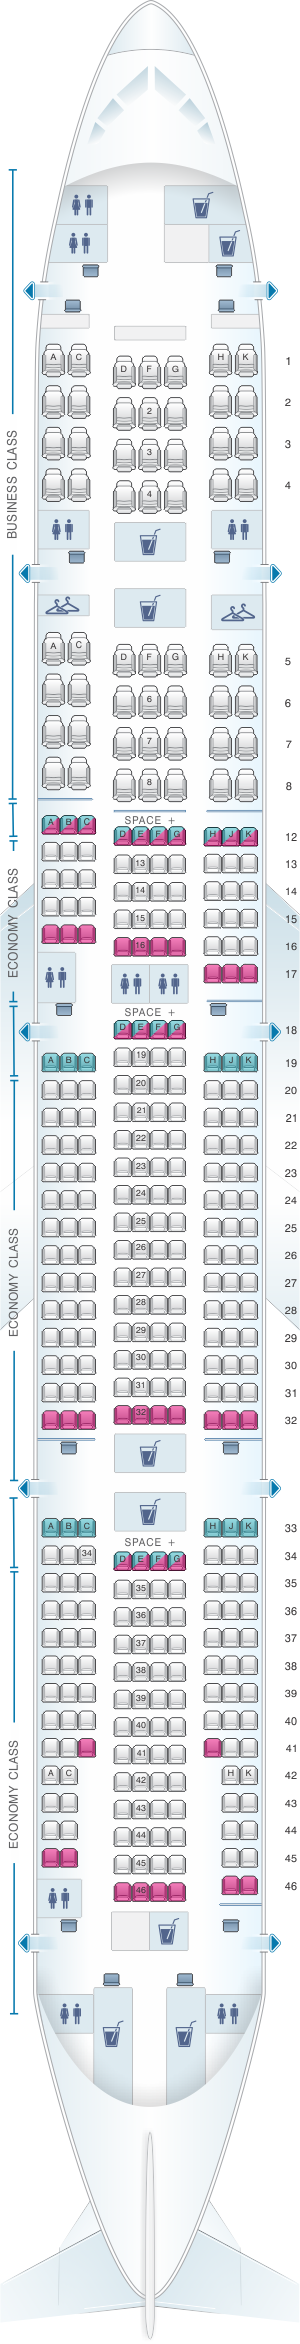 Plan de cabine latam airlines brasil boeing b777 300er v2 for Plan cabine 777 300er